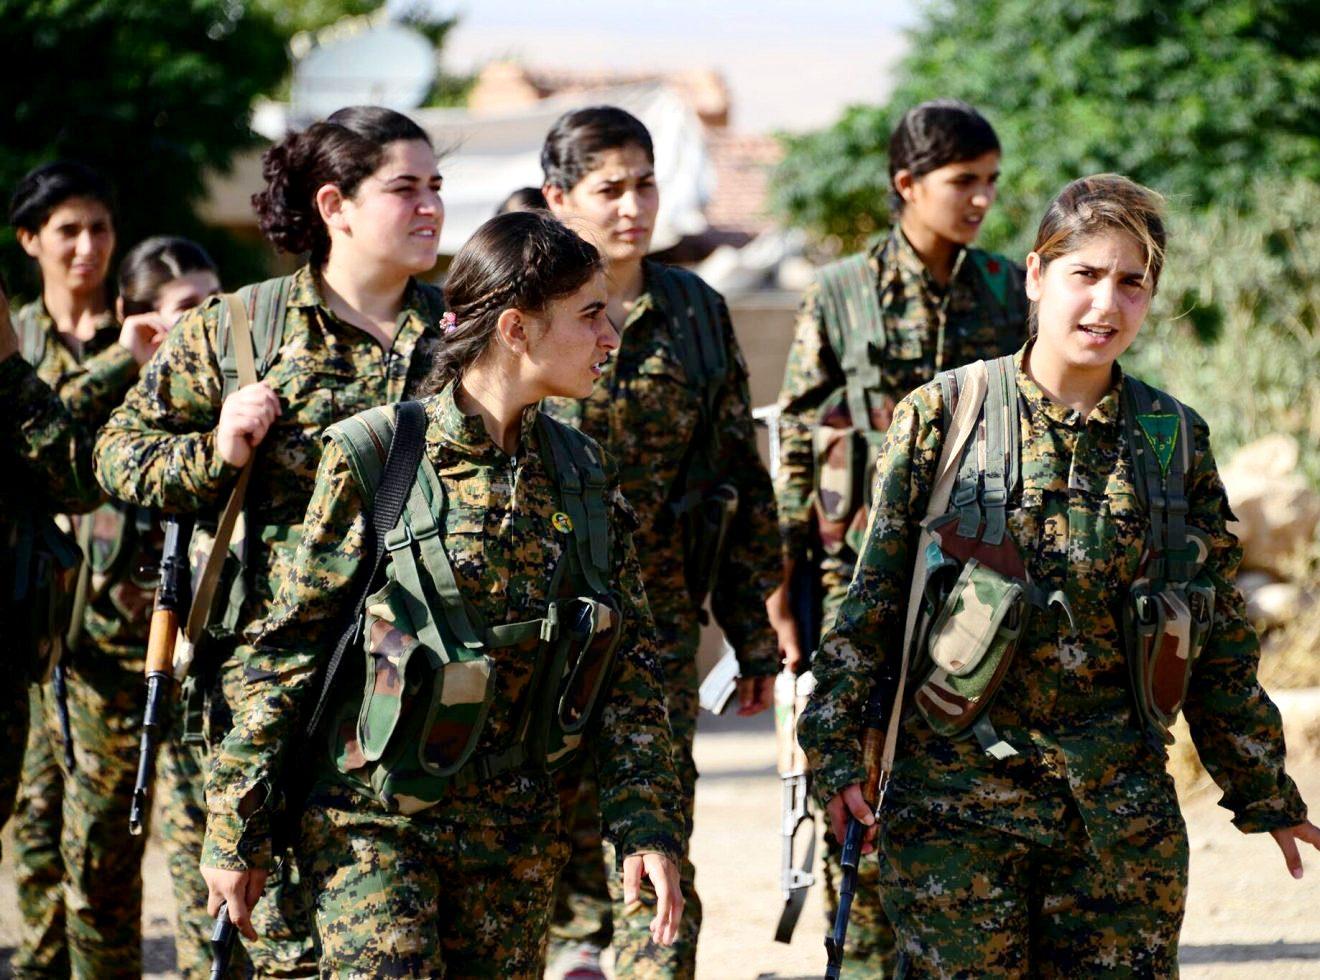 «H δυστυχία των Κούρδων είναι ότι καταλαμβάνουν μια περιοχή με υψίστη γεωπολιτική σημασία»